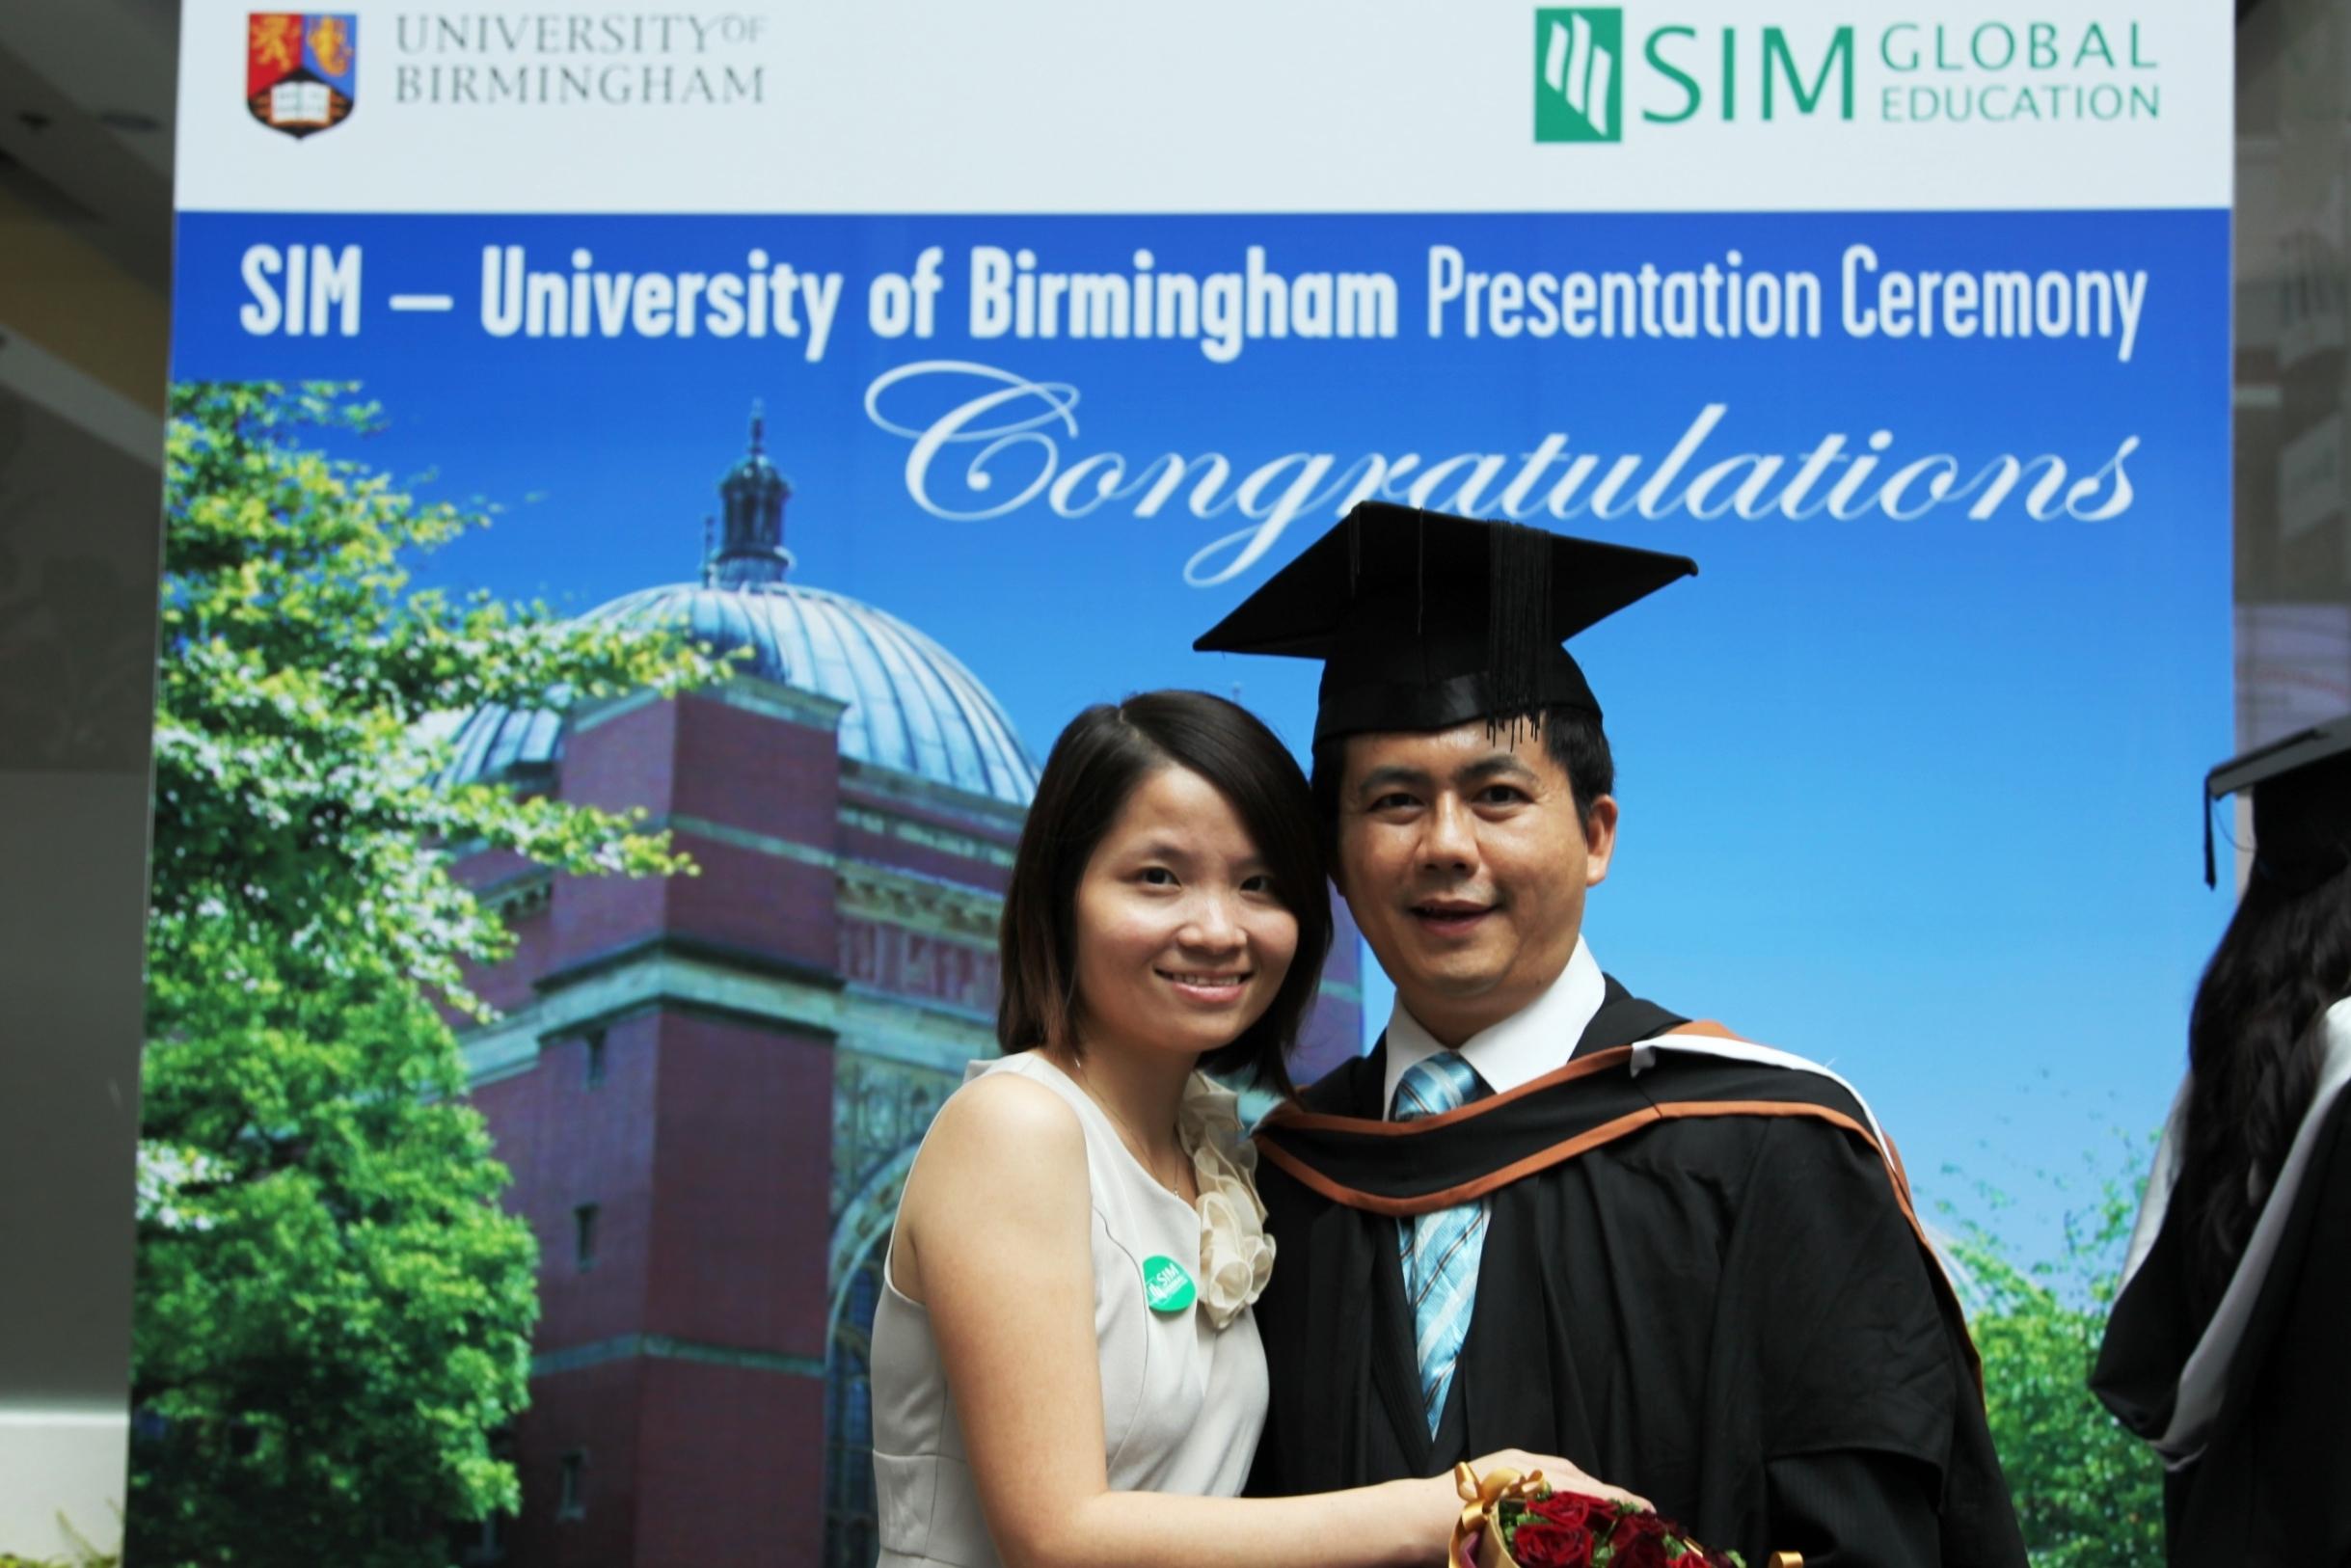 SIM Graduation Photo Gallery - University of Birmingham